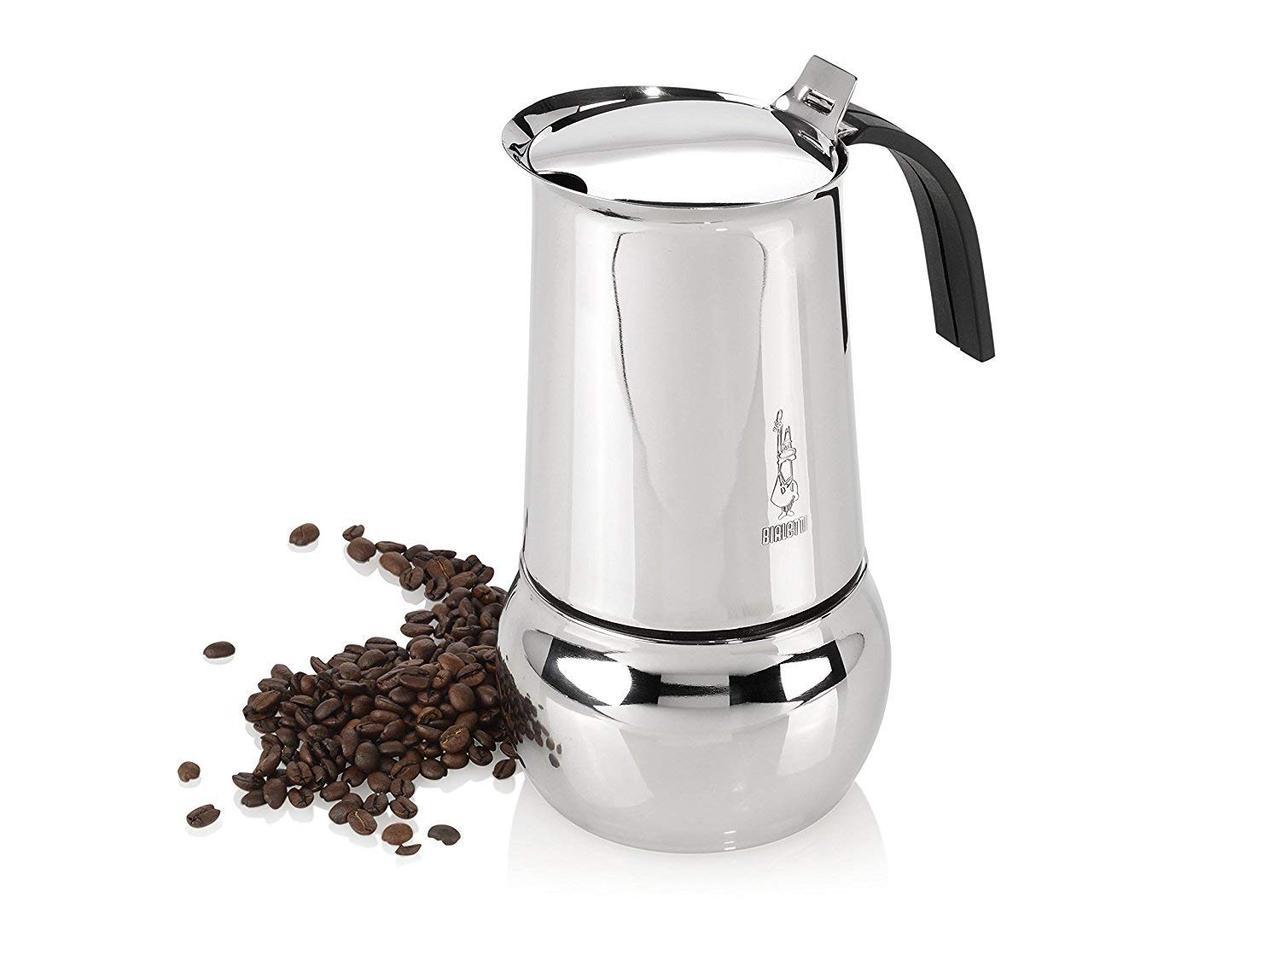 Гейзерная кофеварка Bialetti Kitty (10 чашек - 500 мл)